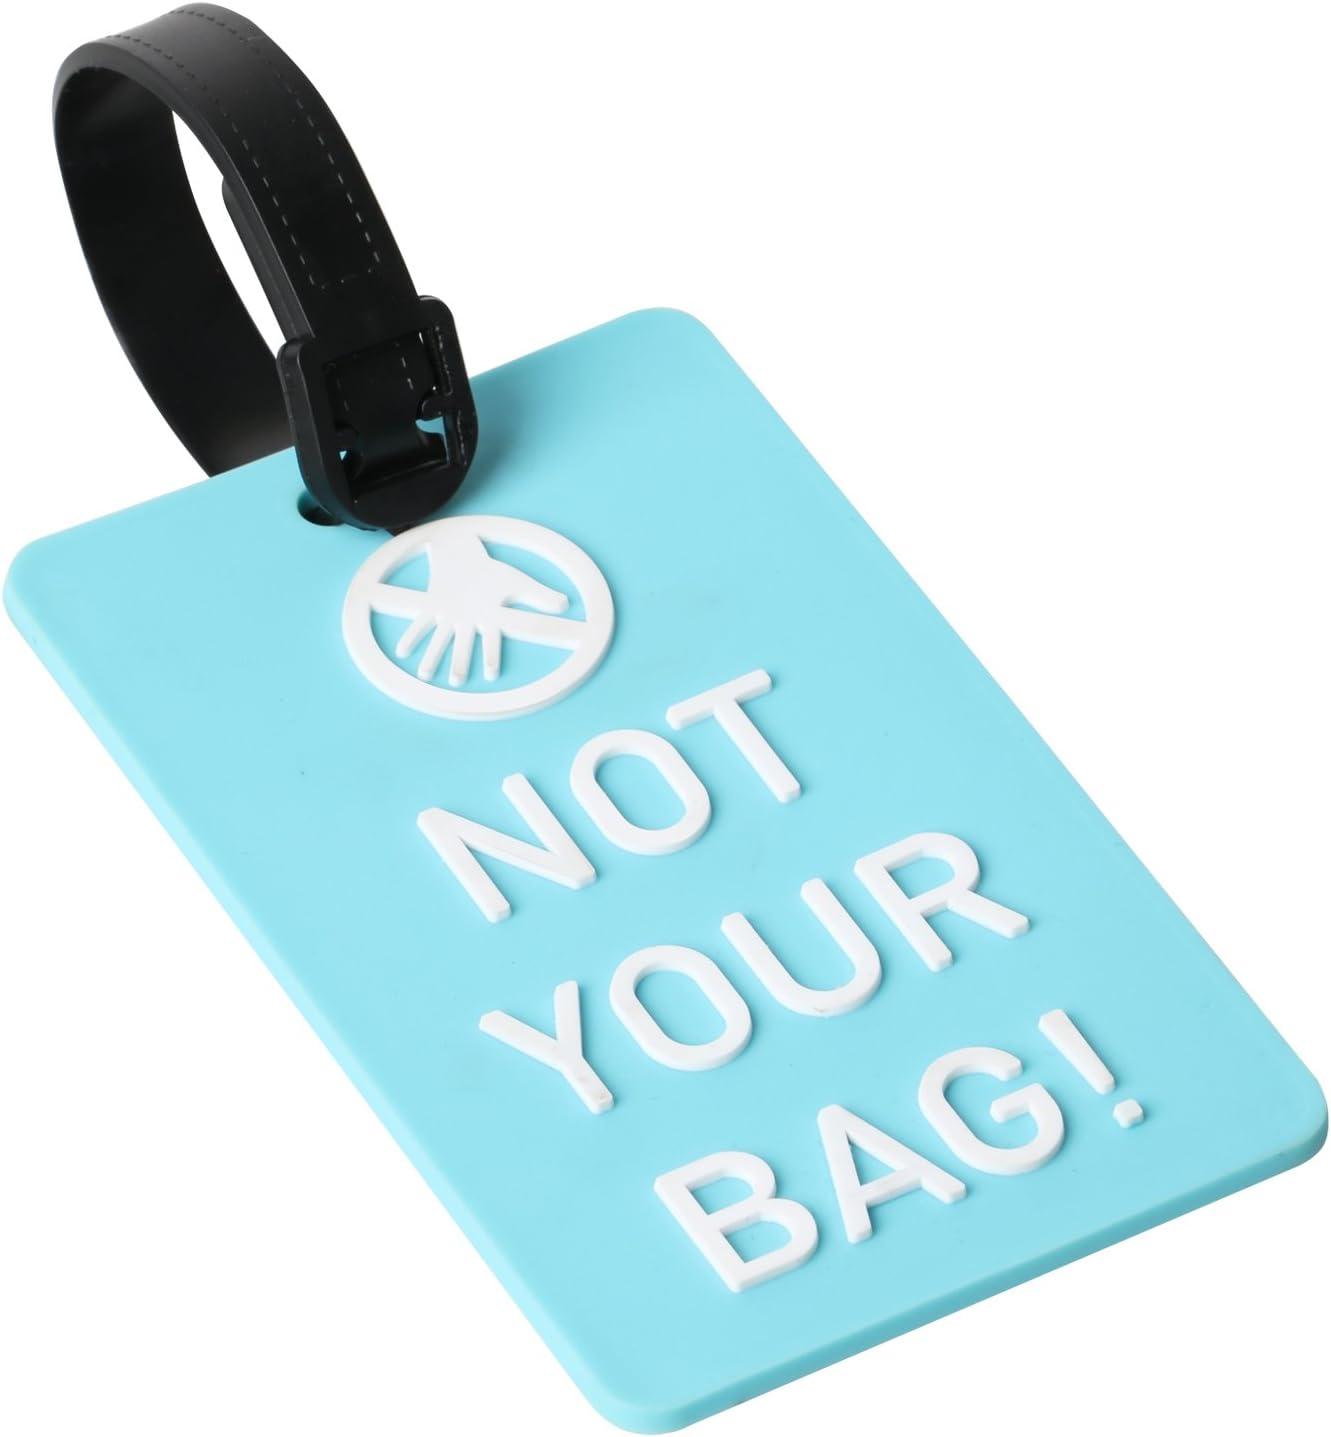 TRIXES Etiqueta para Equipaje Not Your Bag! Etiqueta Identificadora - Azul y Blanca